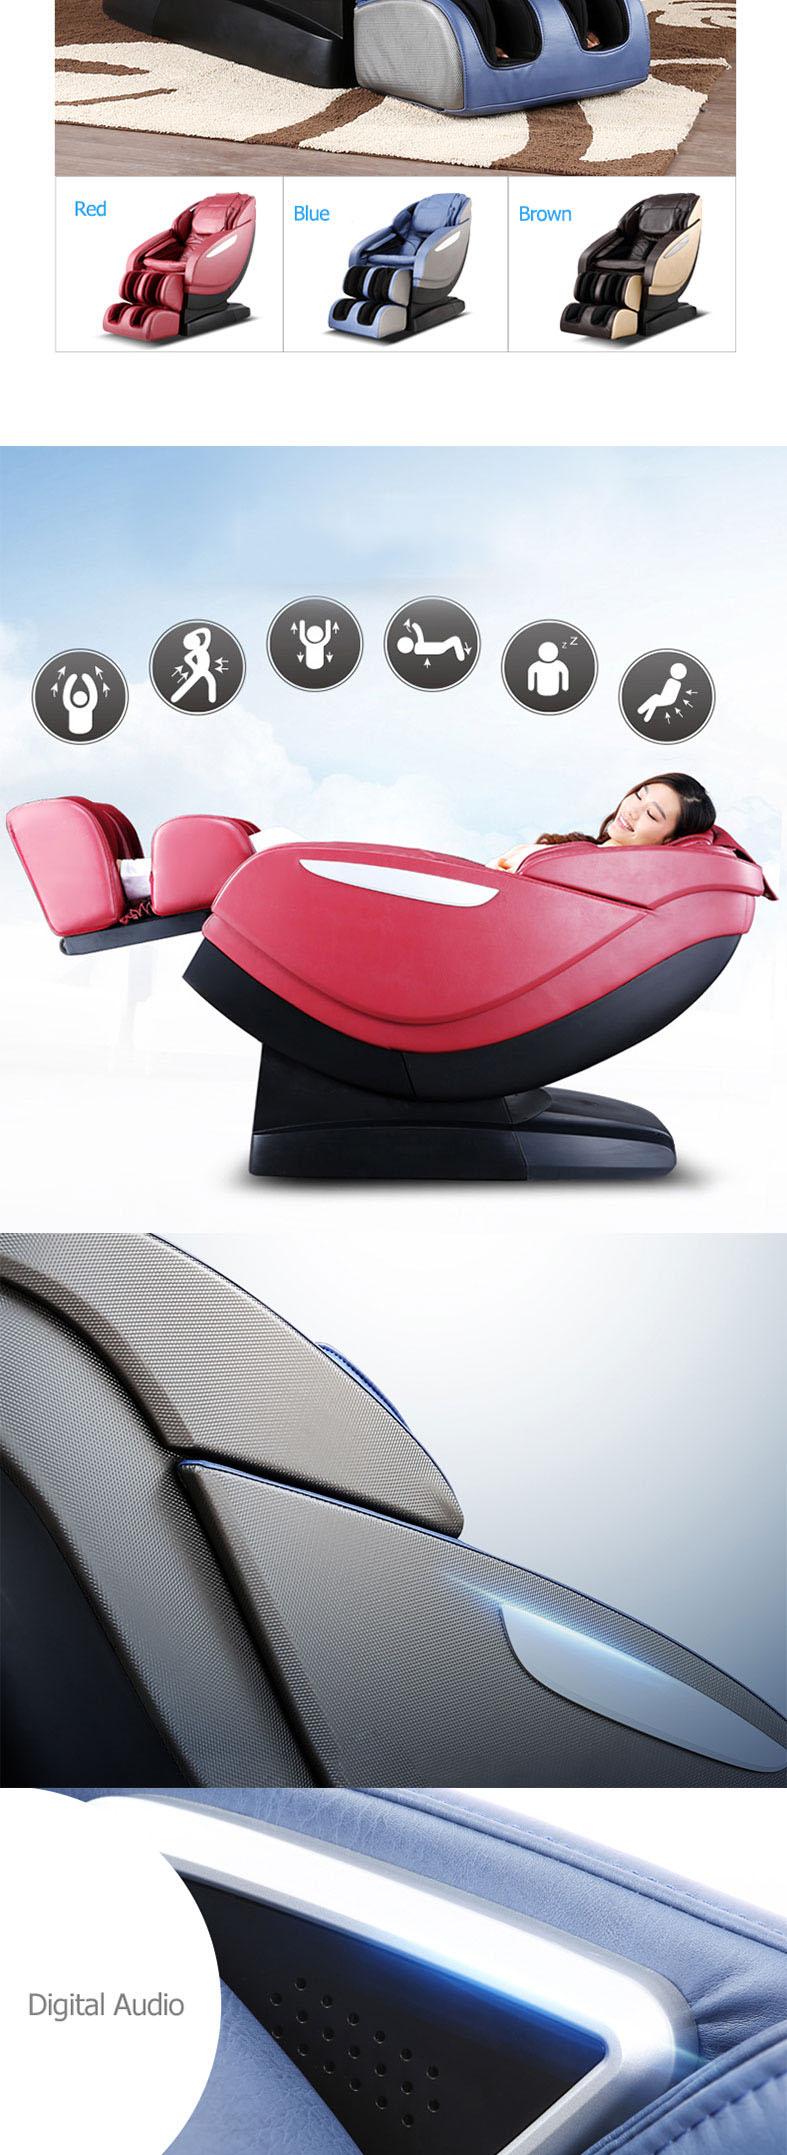 China Top Thai Shiatsu Reclining Massage Chair